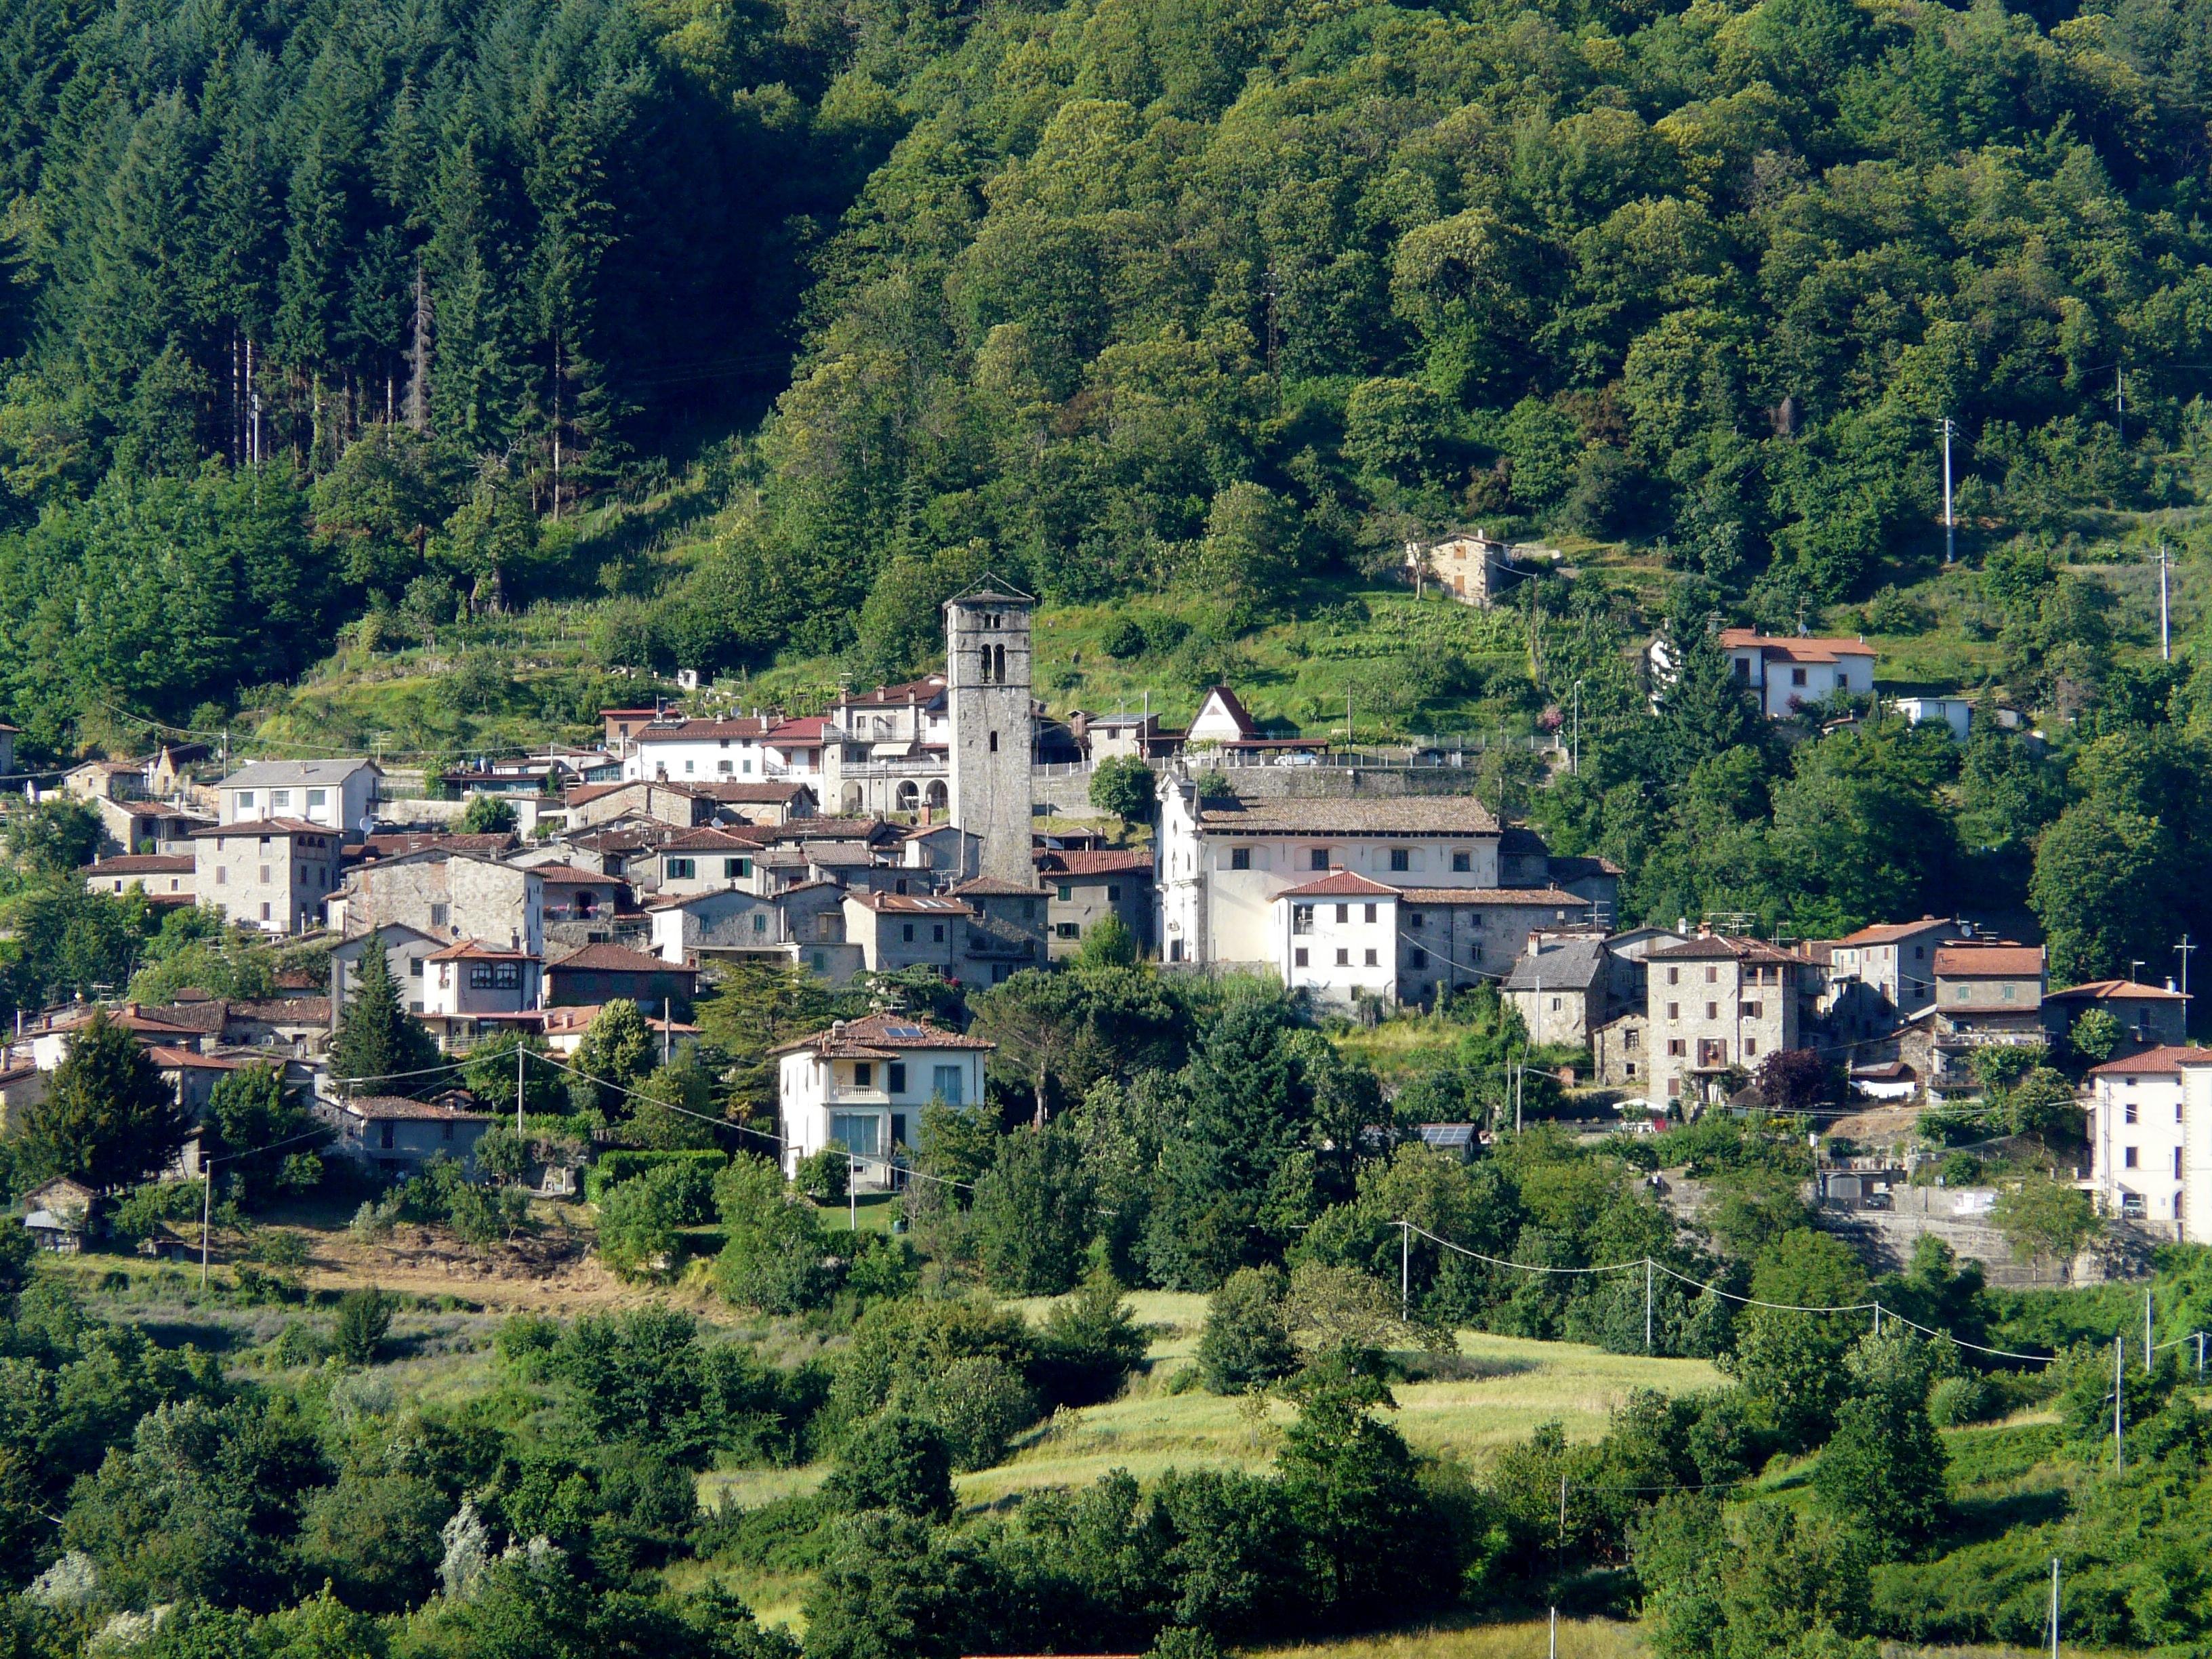 San Romano in Garfagnana panorama6